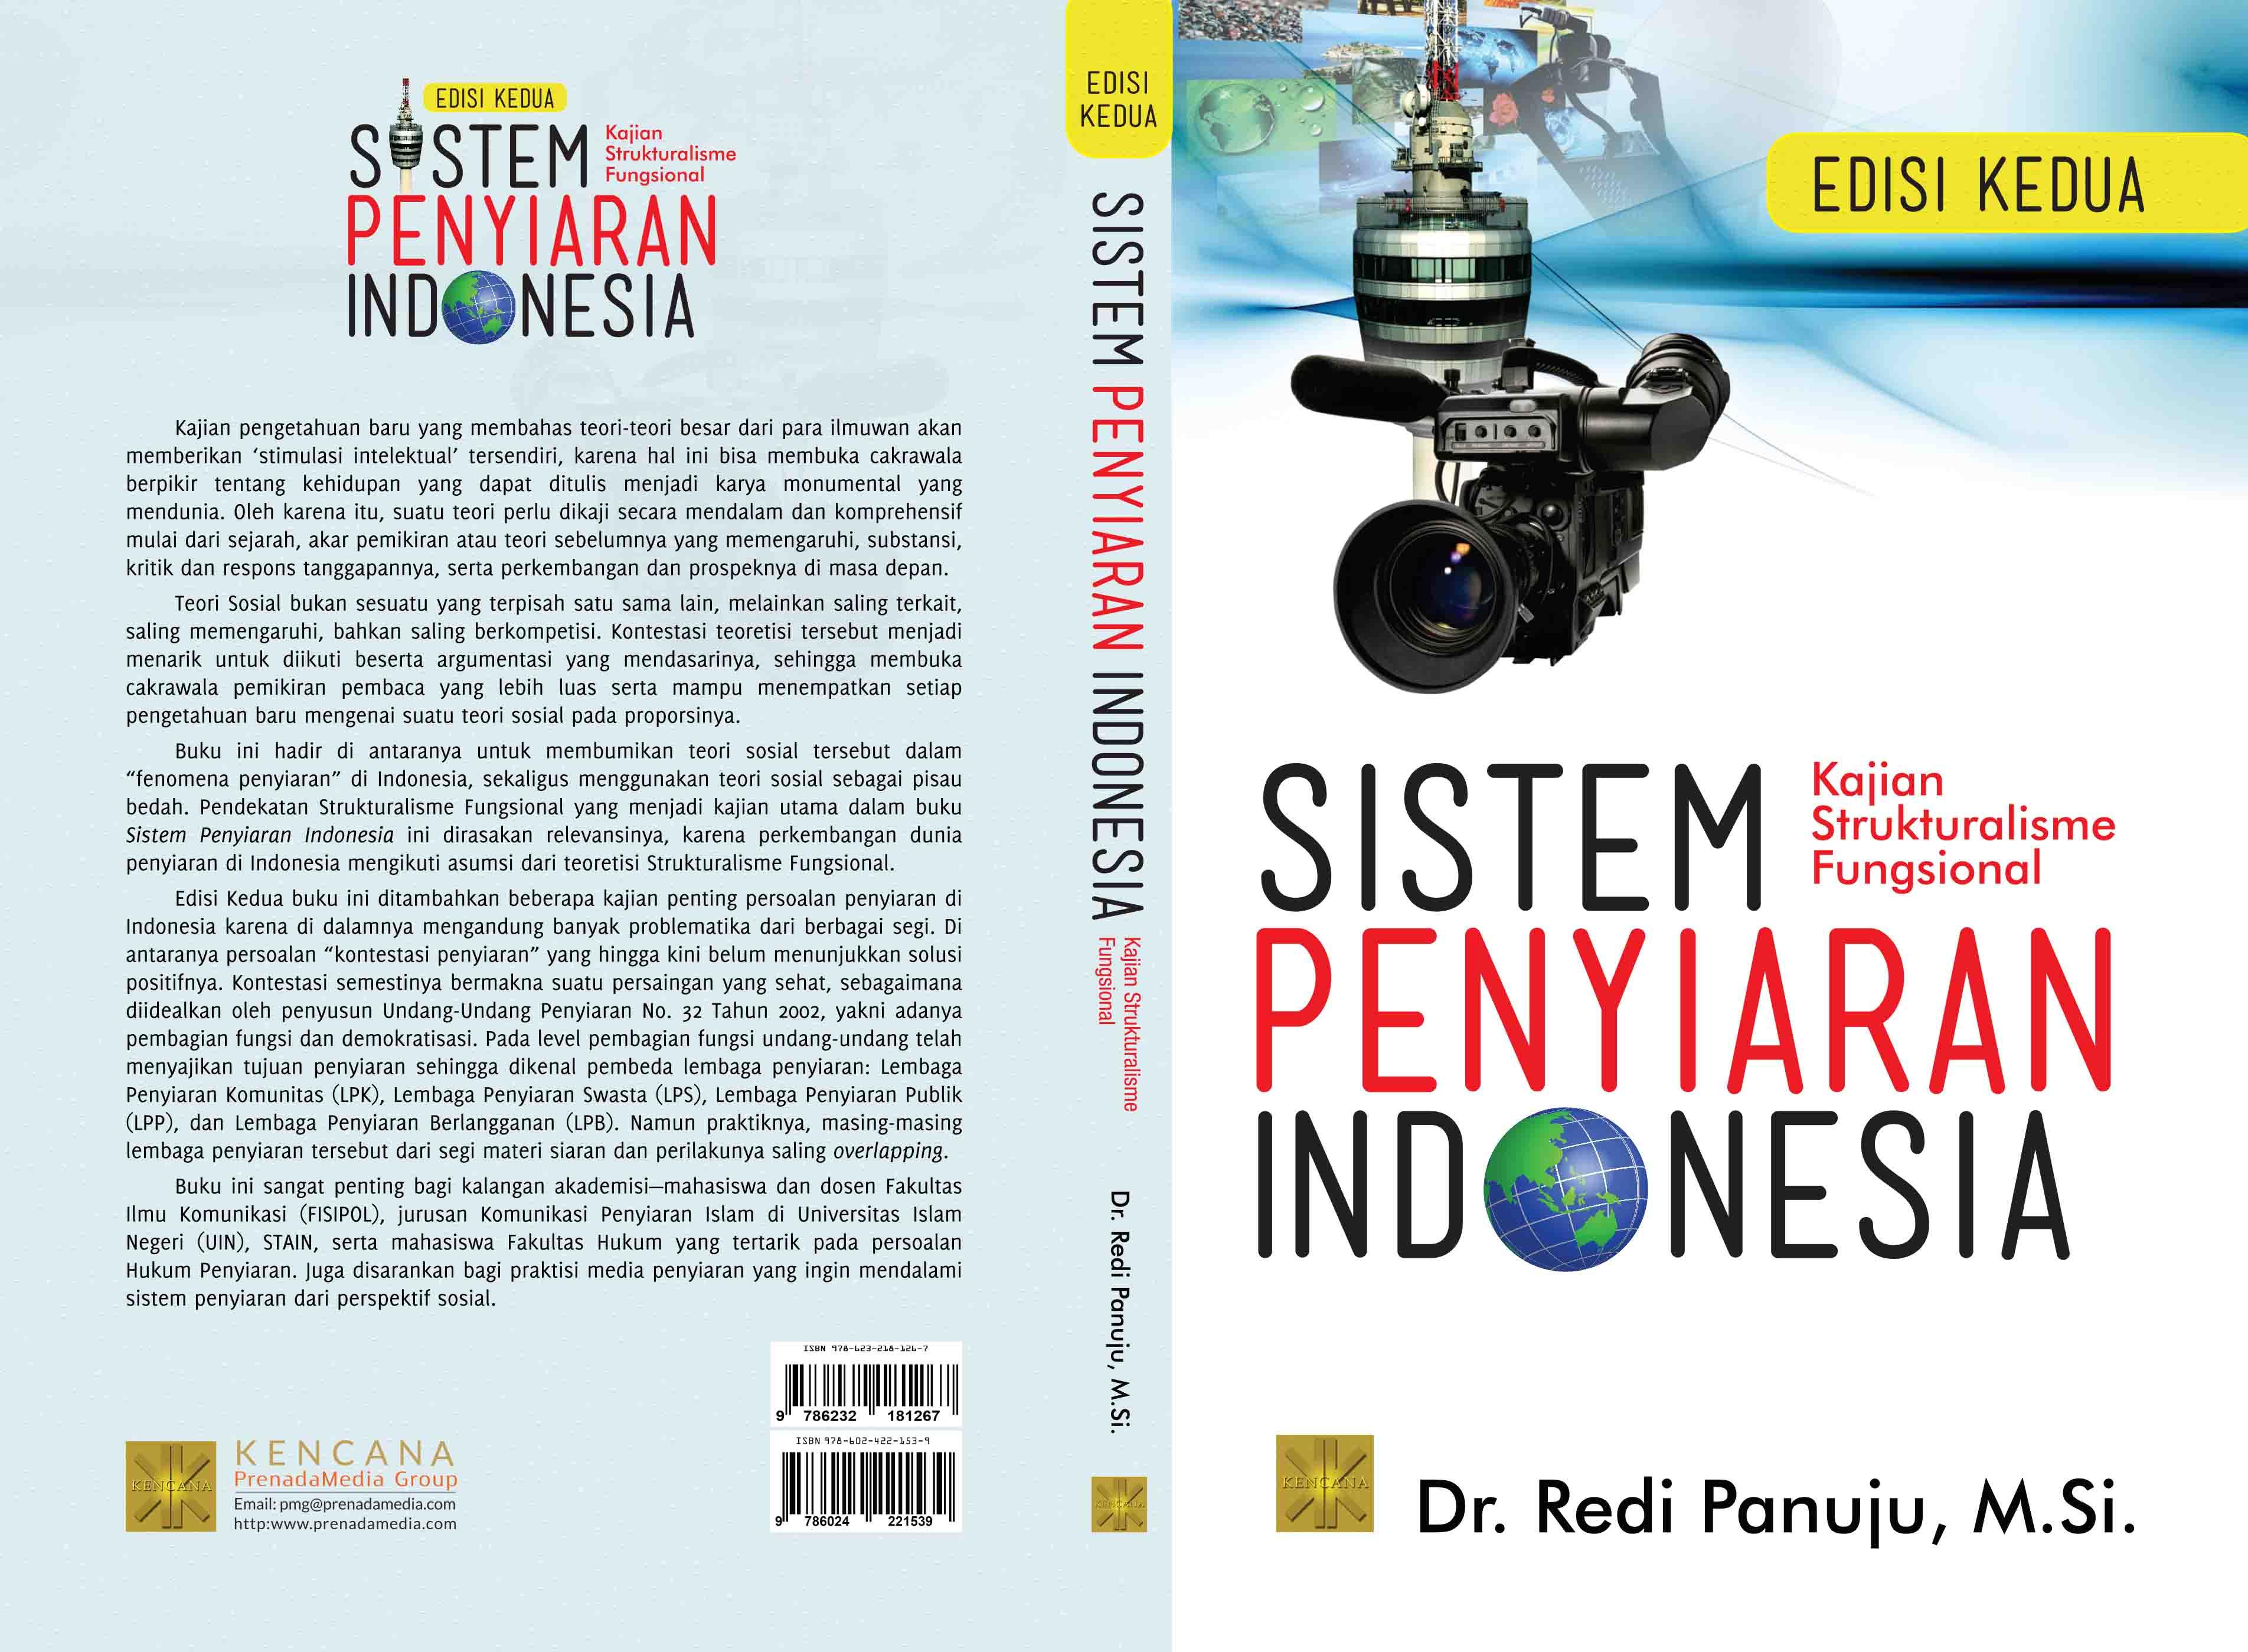 Sistem penyiaran Indonesia [sumber elektronis] : sebuah kajian strukturalisme fungsional